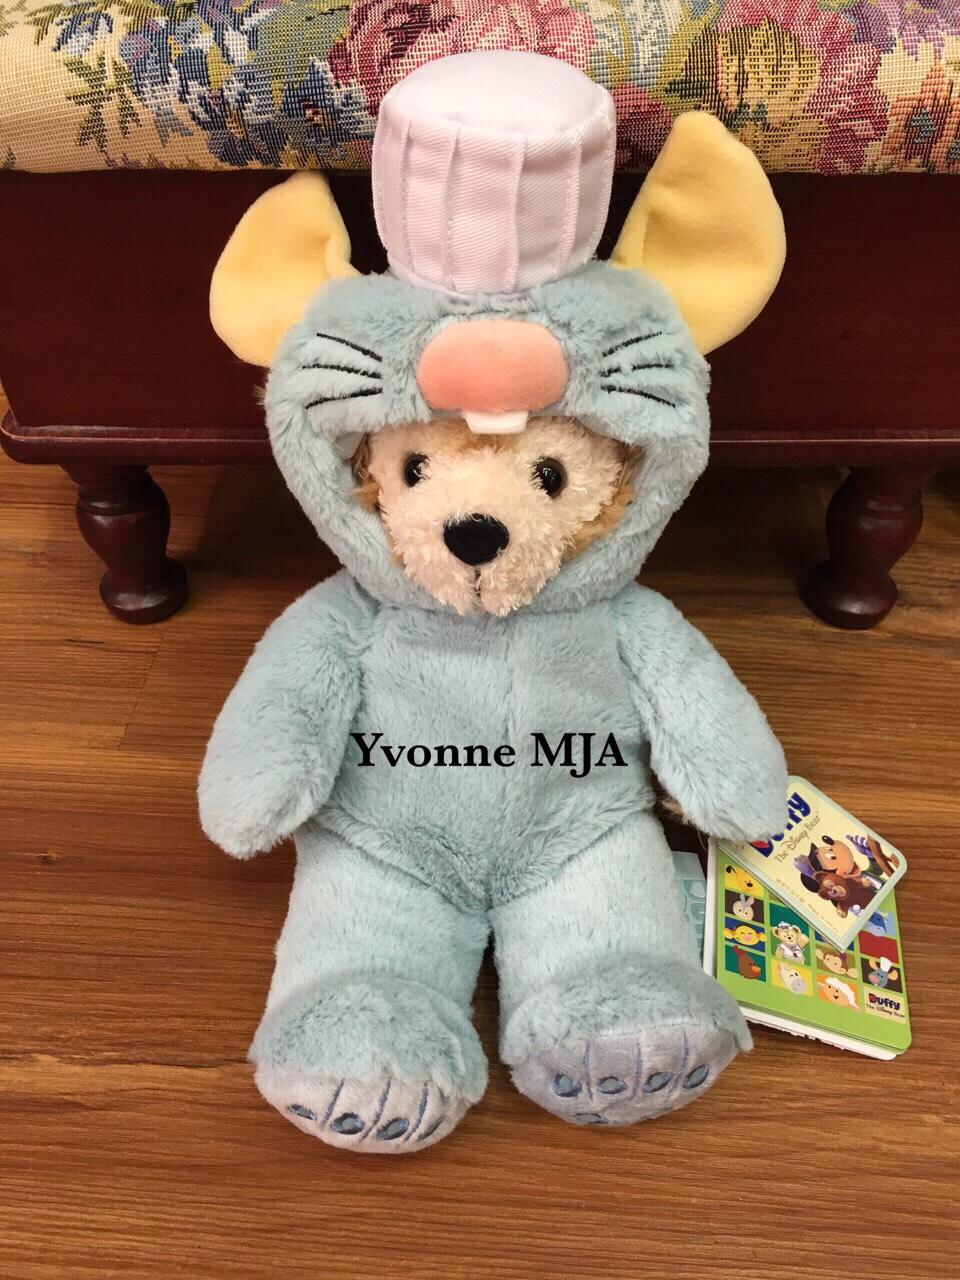 *Yvonne MJA上海代購*上海迪士尼樂園限定正品Duffy達菲熊料理小老鼠造型SS號娃娃